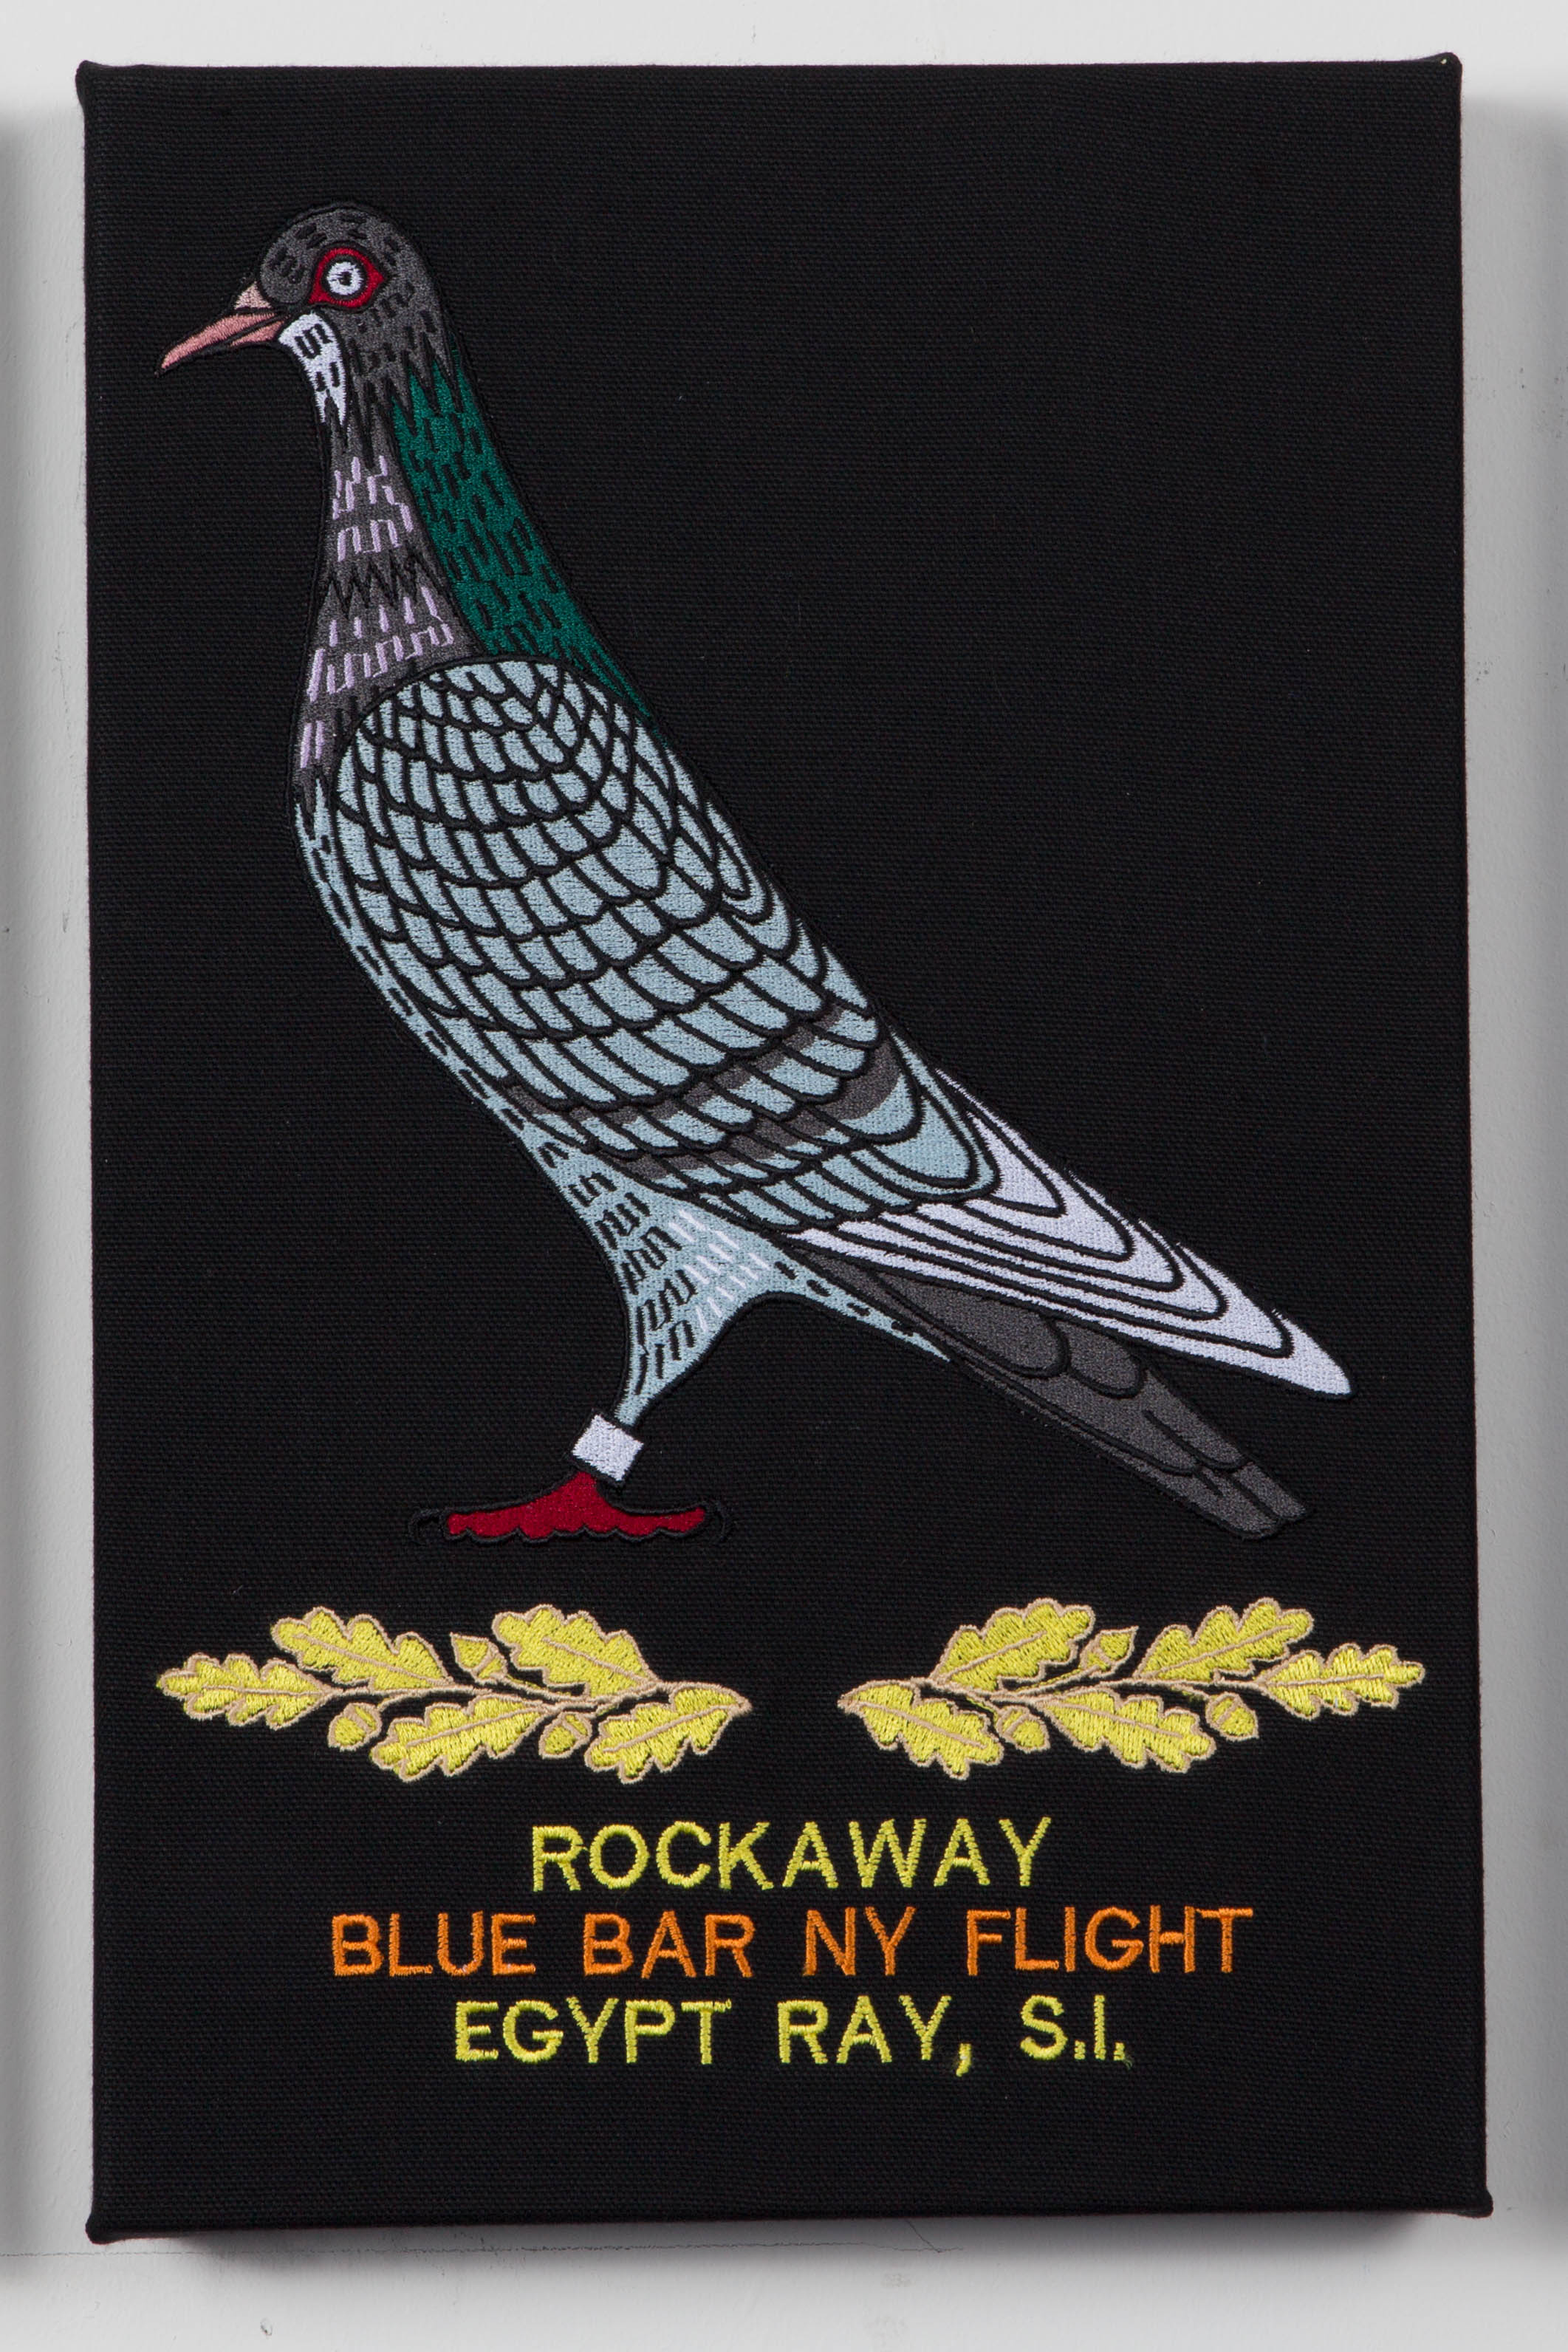 The Army of the Night (Rockaway), 2017